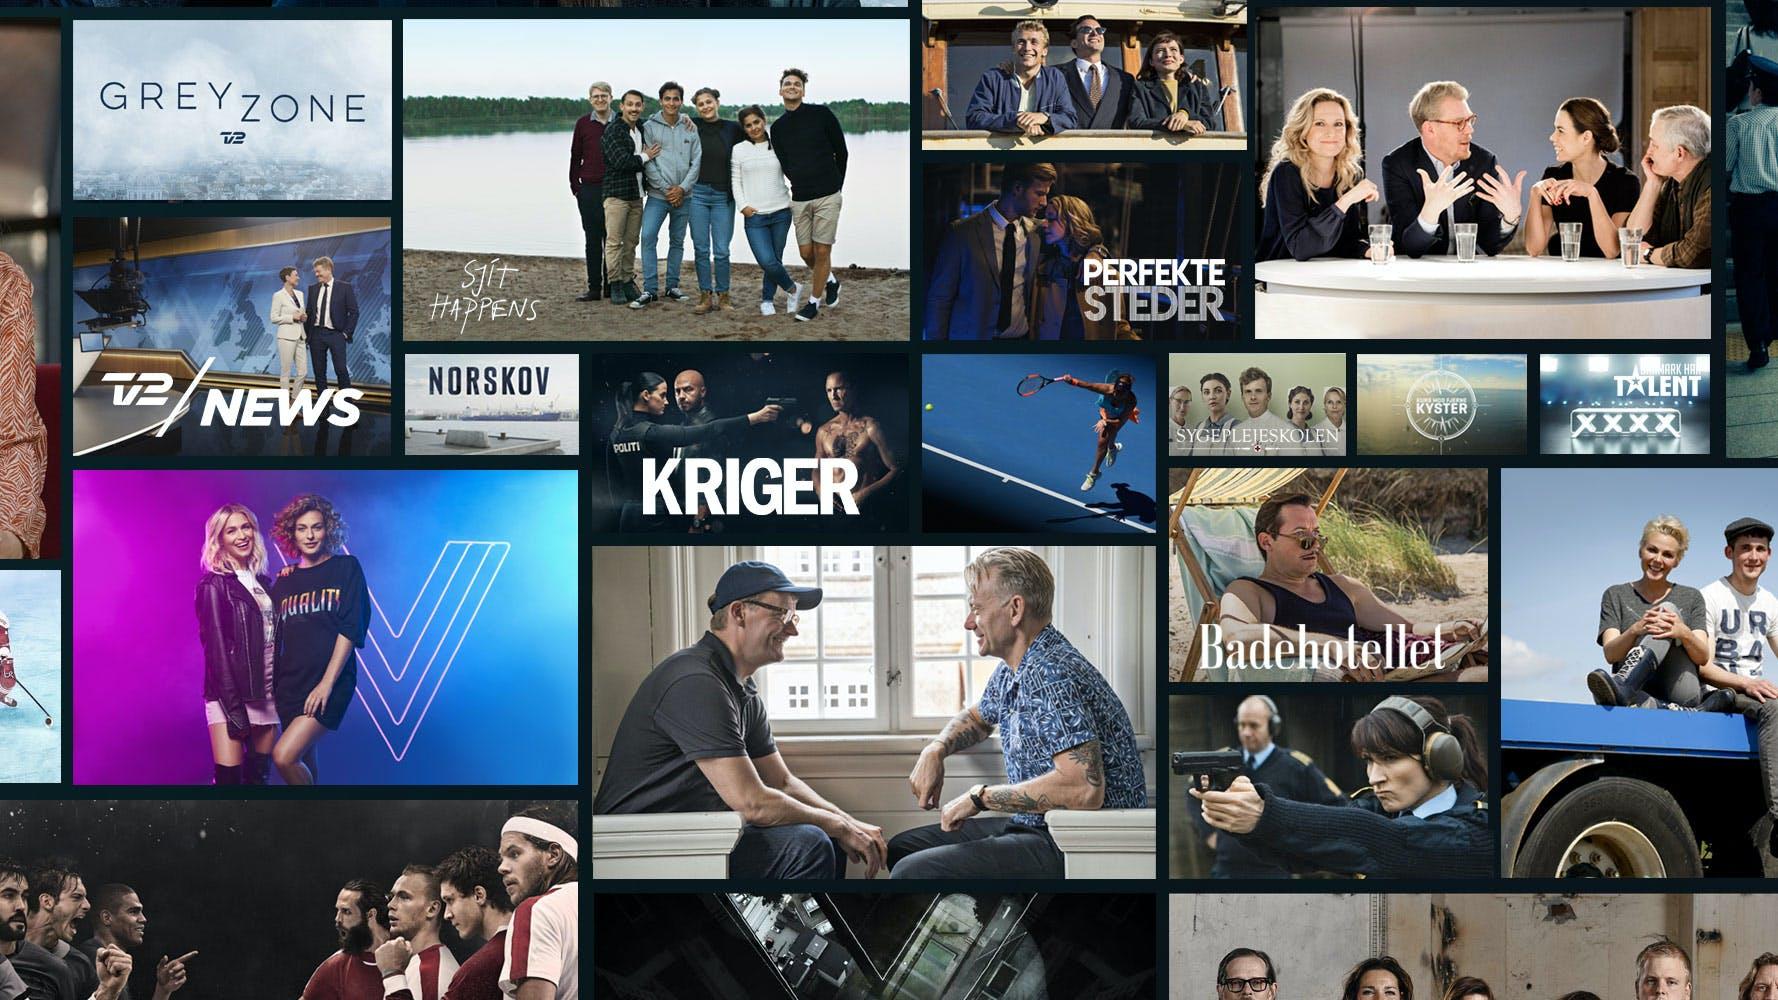 TV 2 Play - Se de bedste serier og programmer fra alle TV 2s kanaler